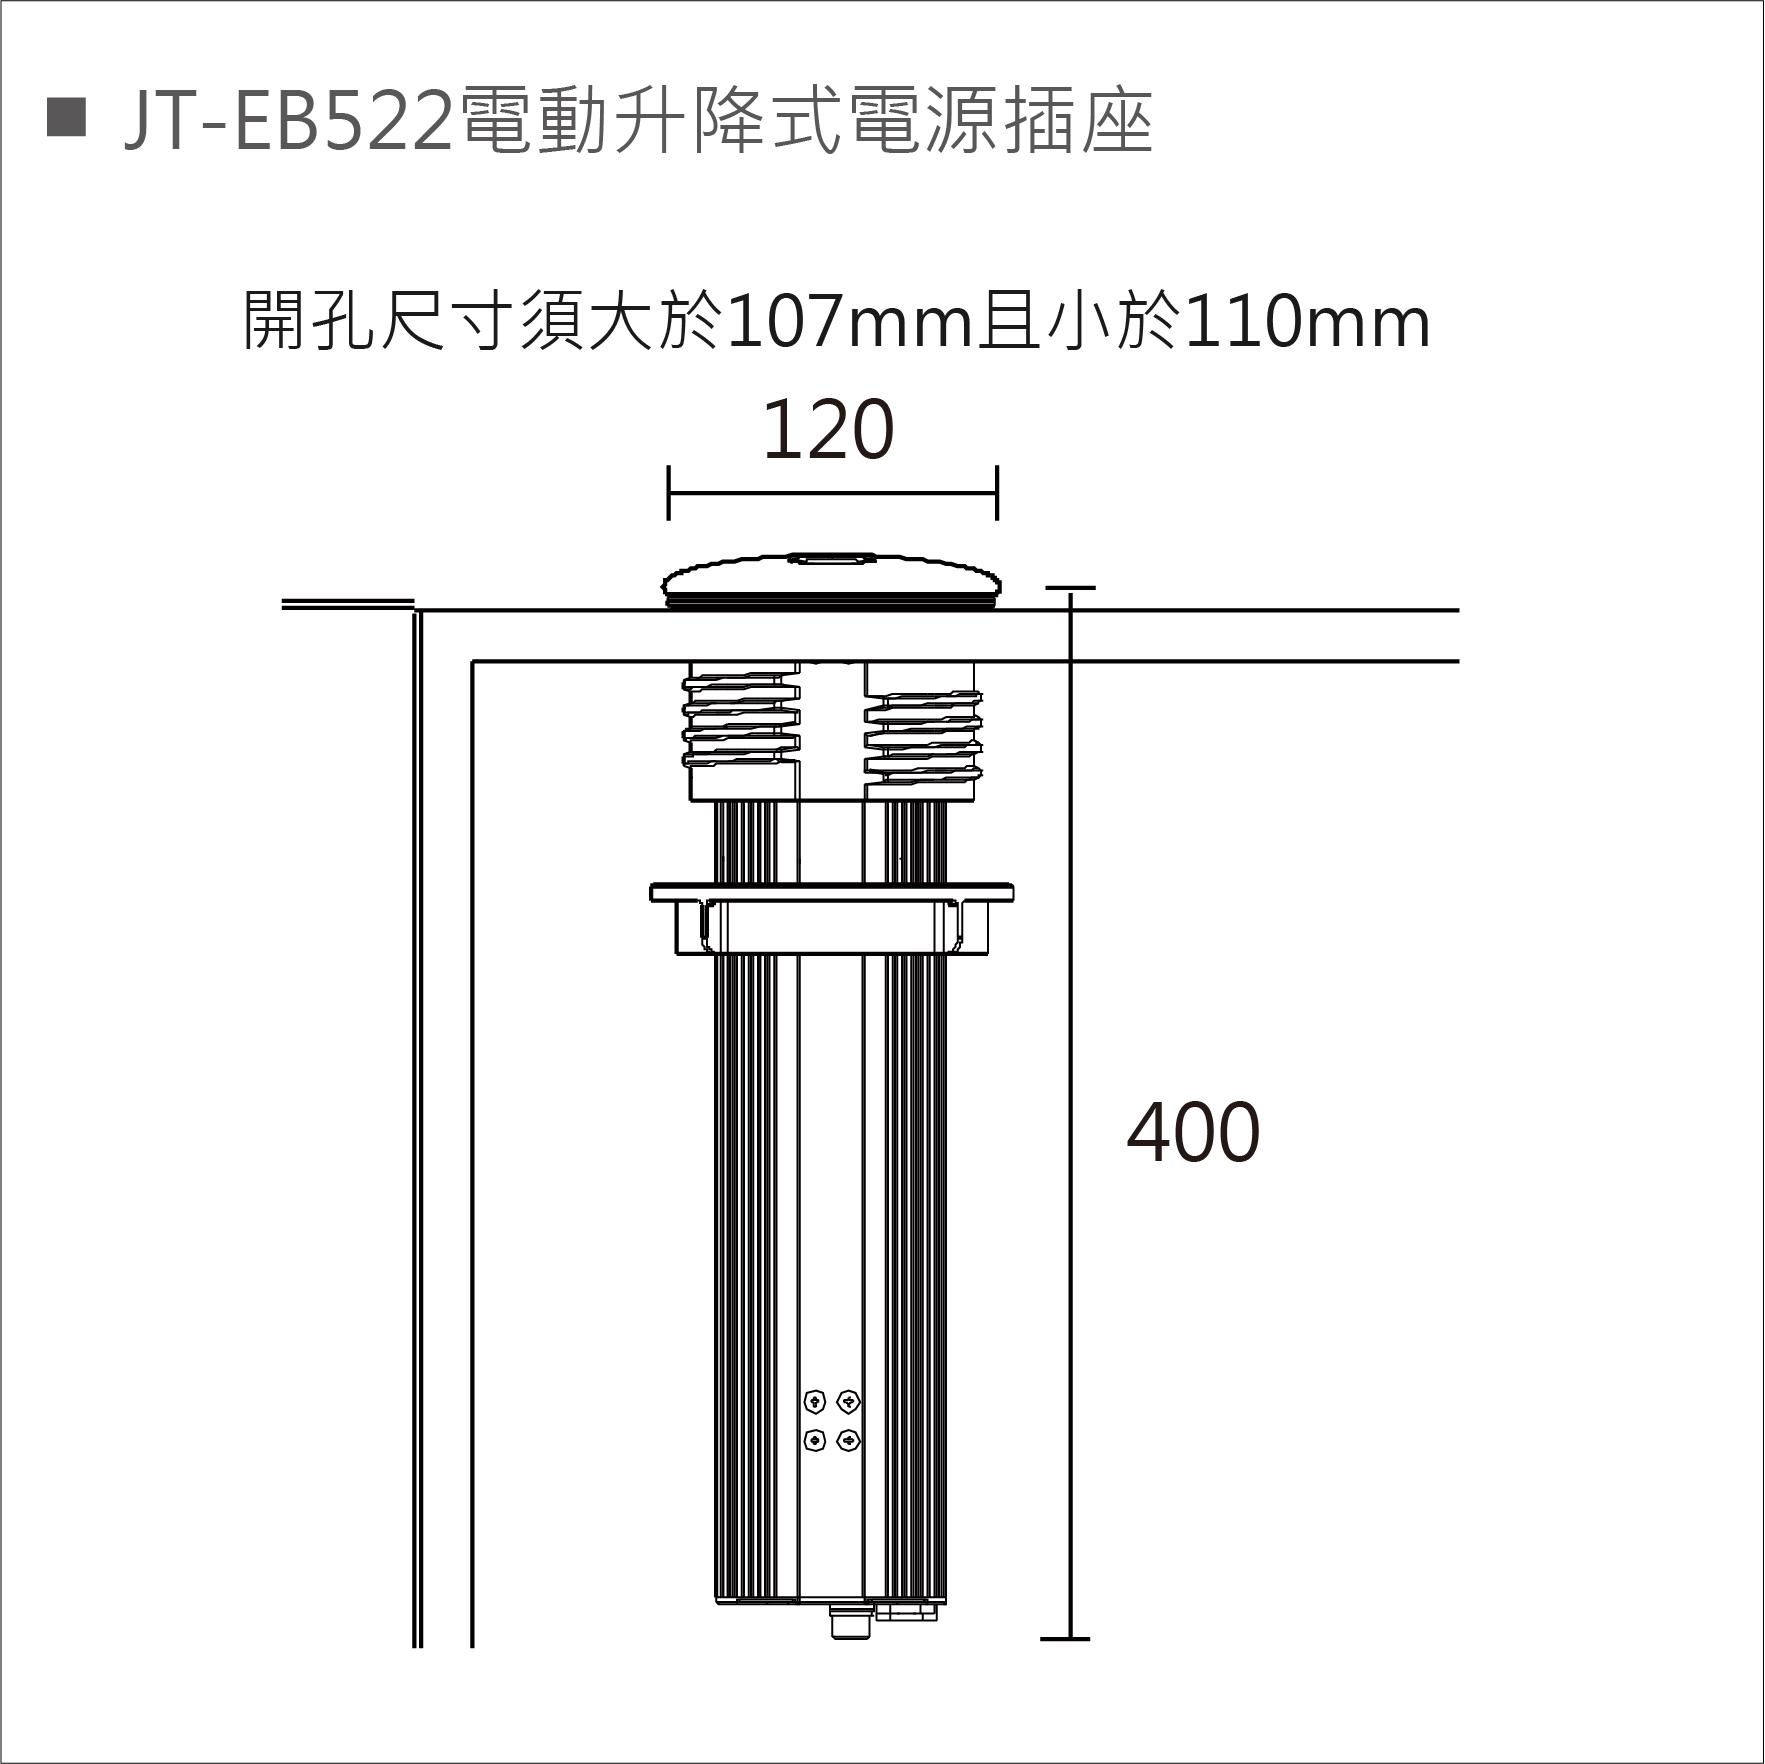 JT-EB522 電動升降式電源插座-JT-EB522